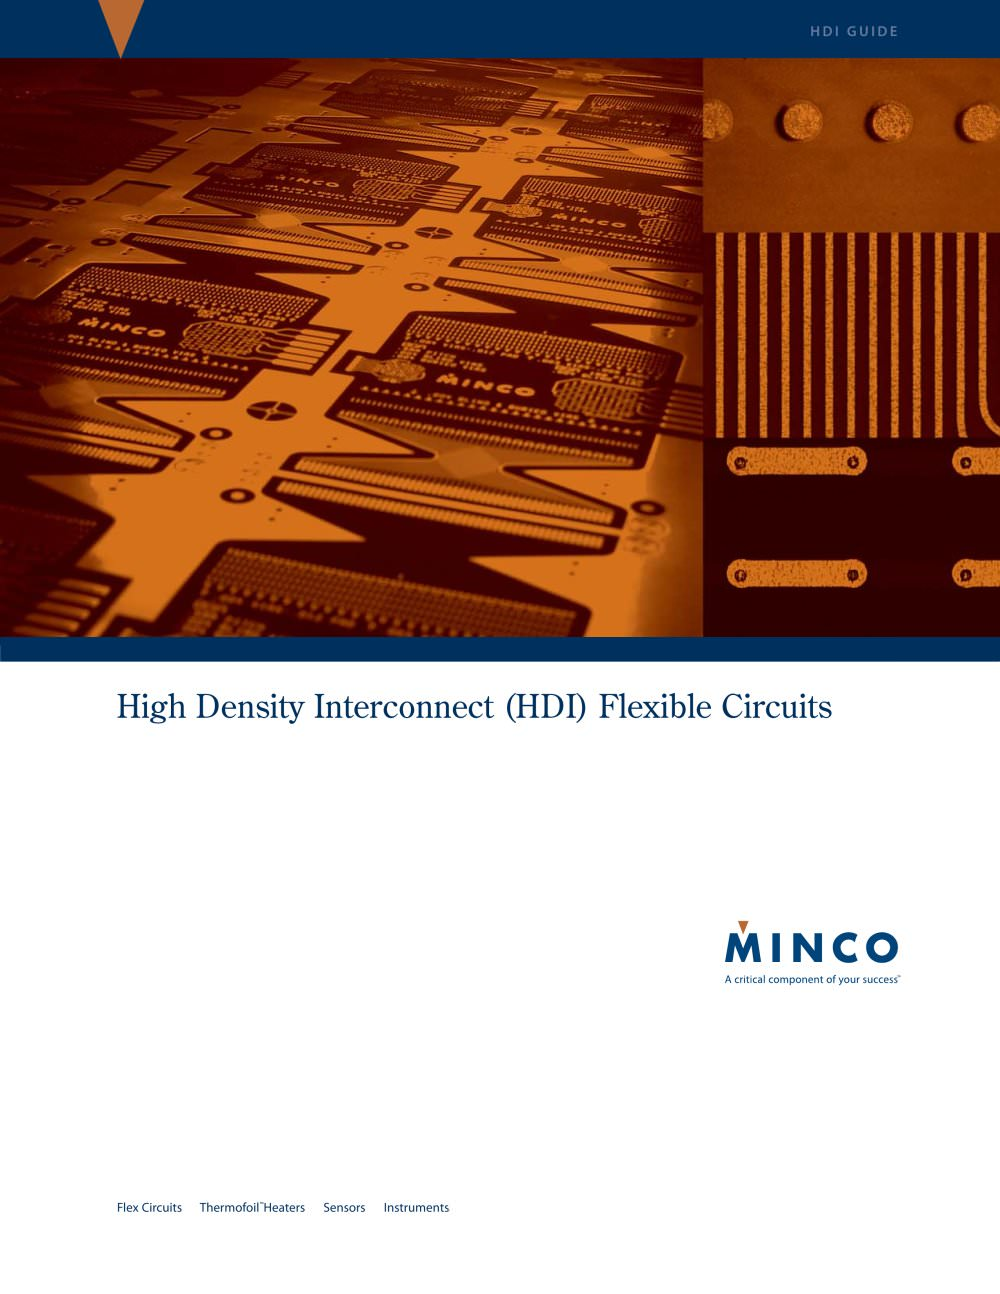 hdi high density interconnect flexible circuits brochure minco